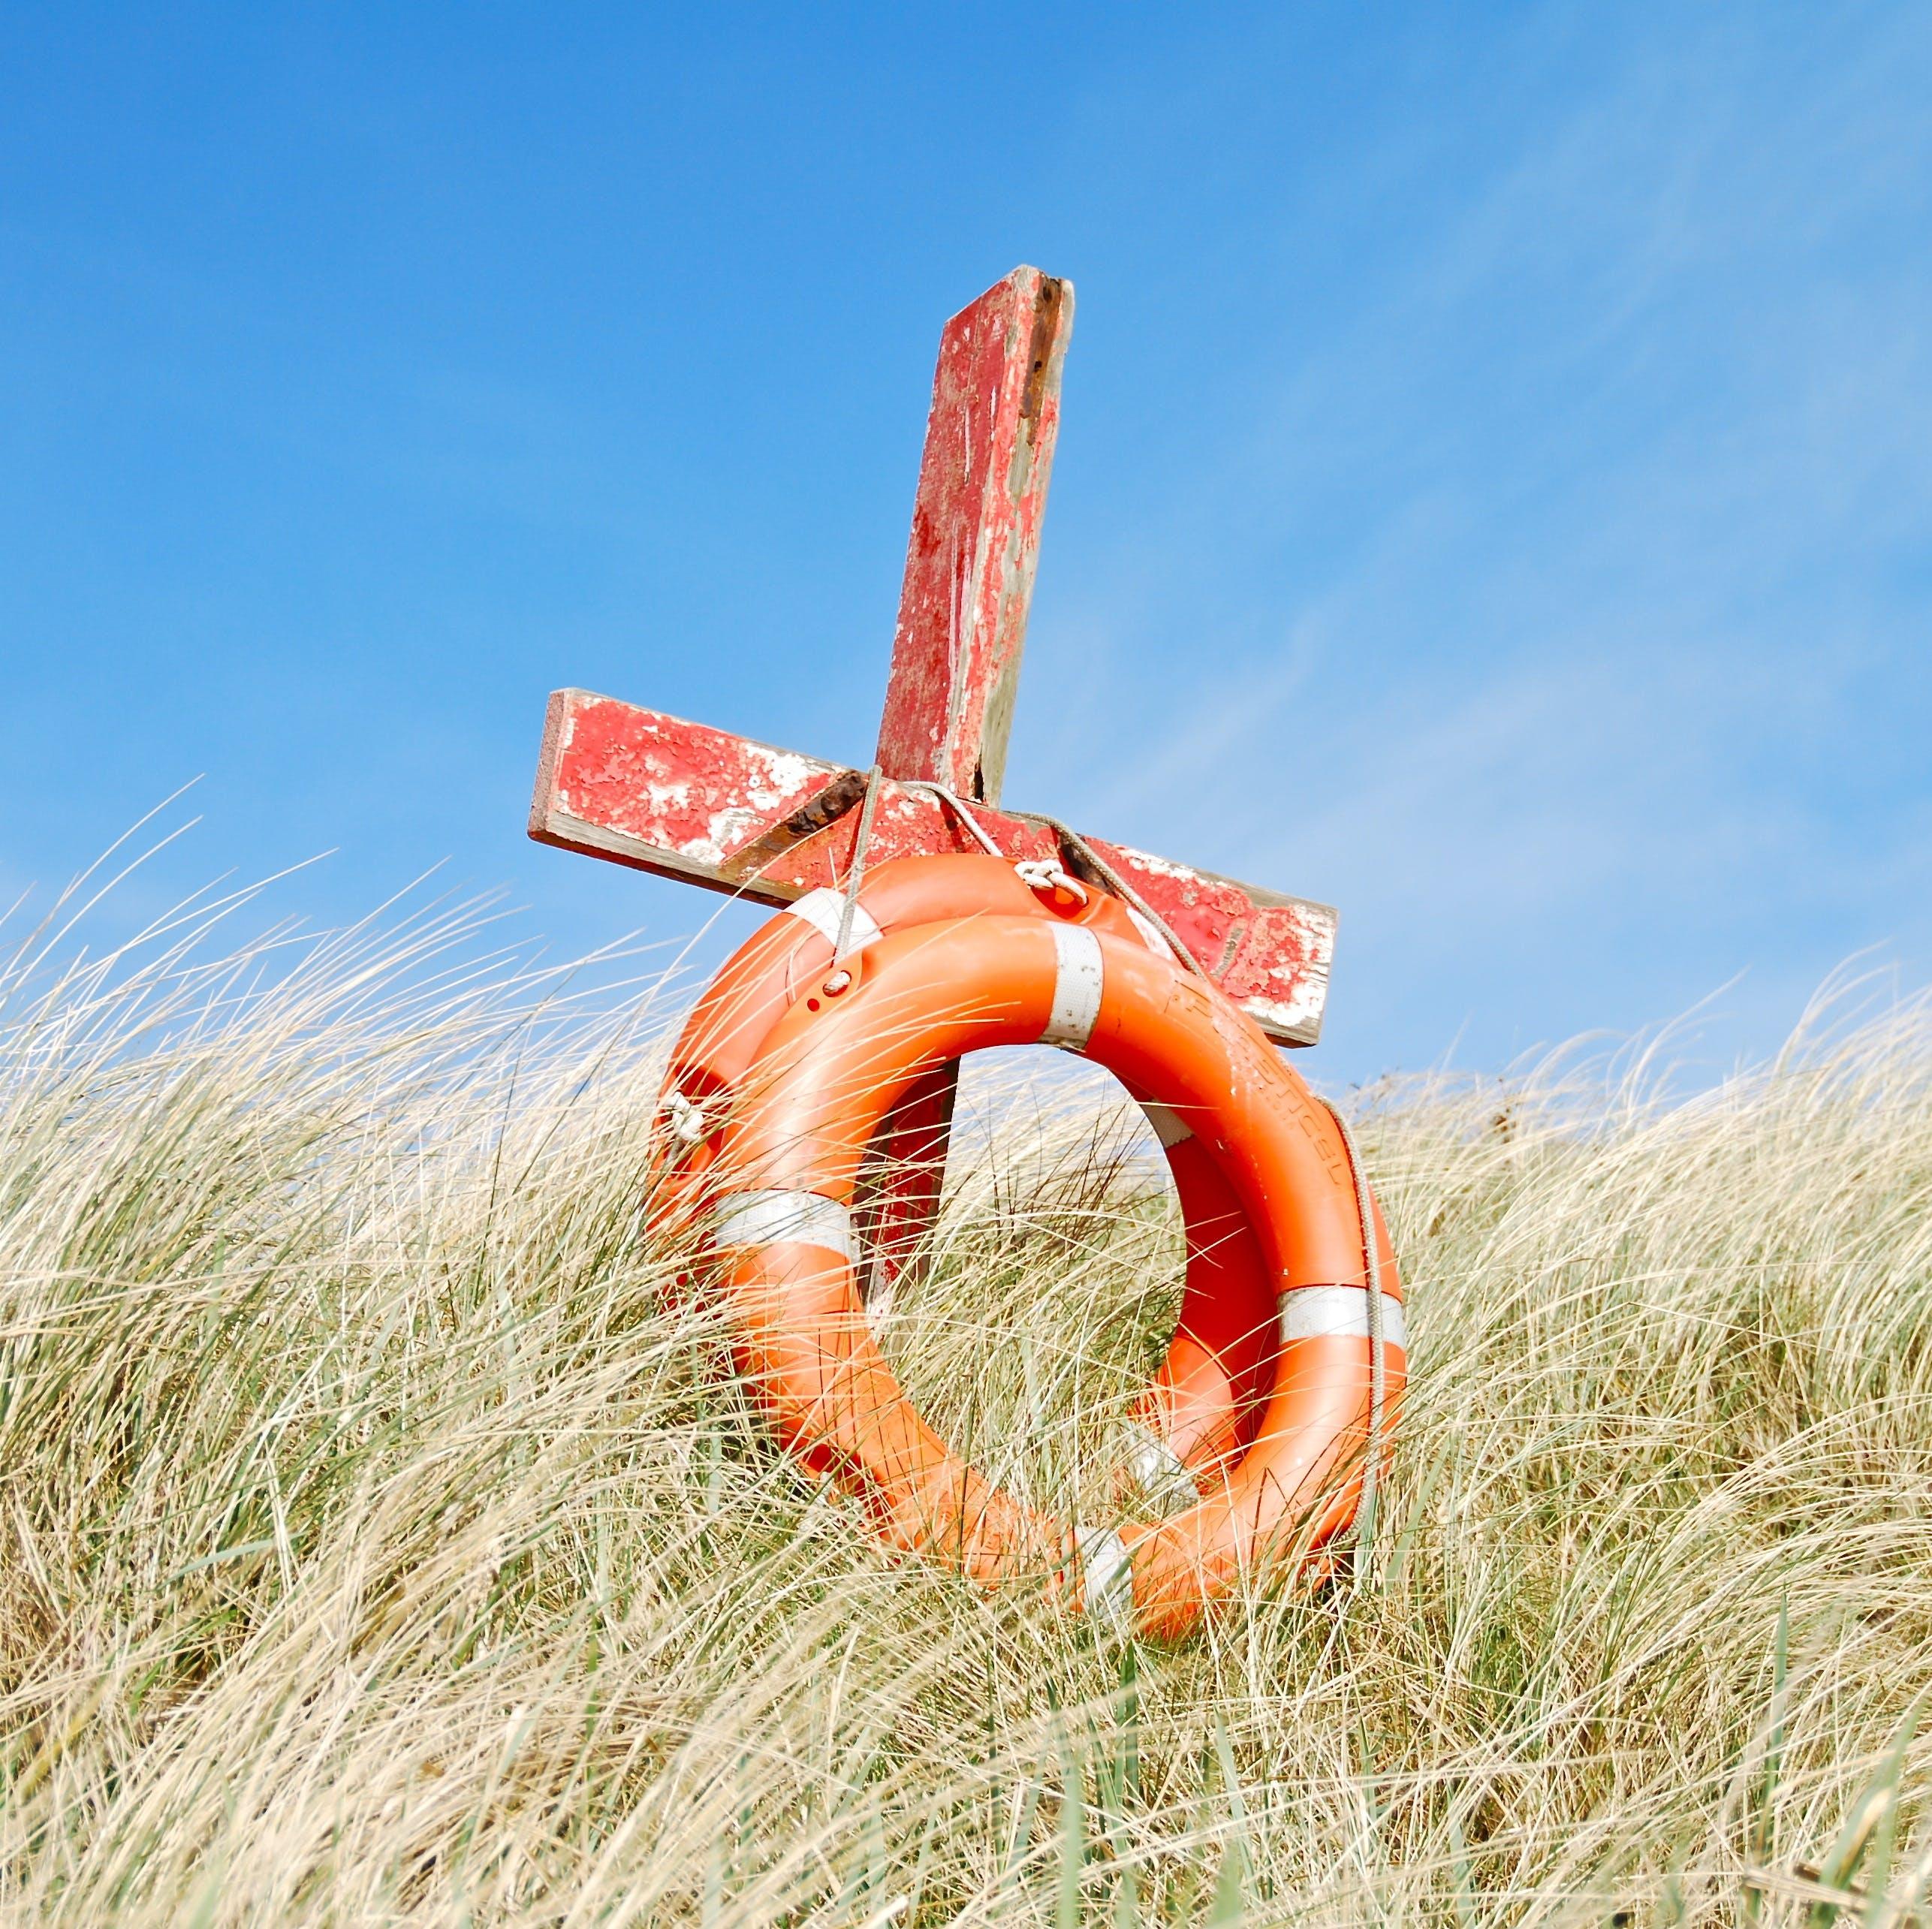 Orange Buoy on Grass